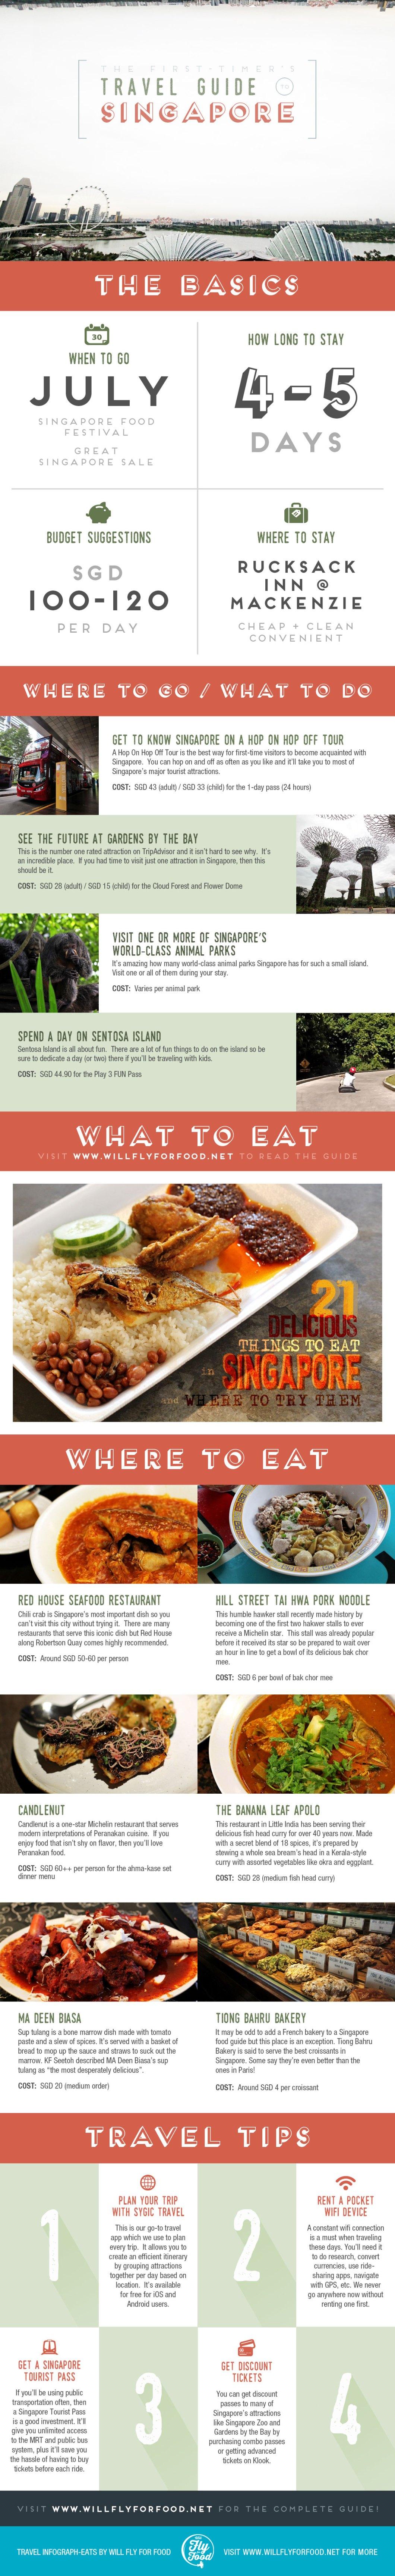 Singapore - Beginner's Travel Guide - Infographic